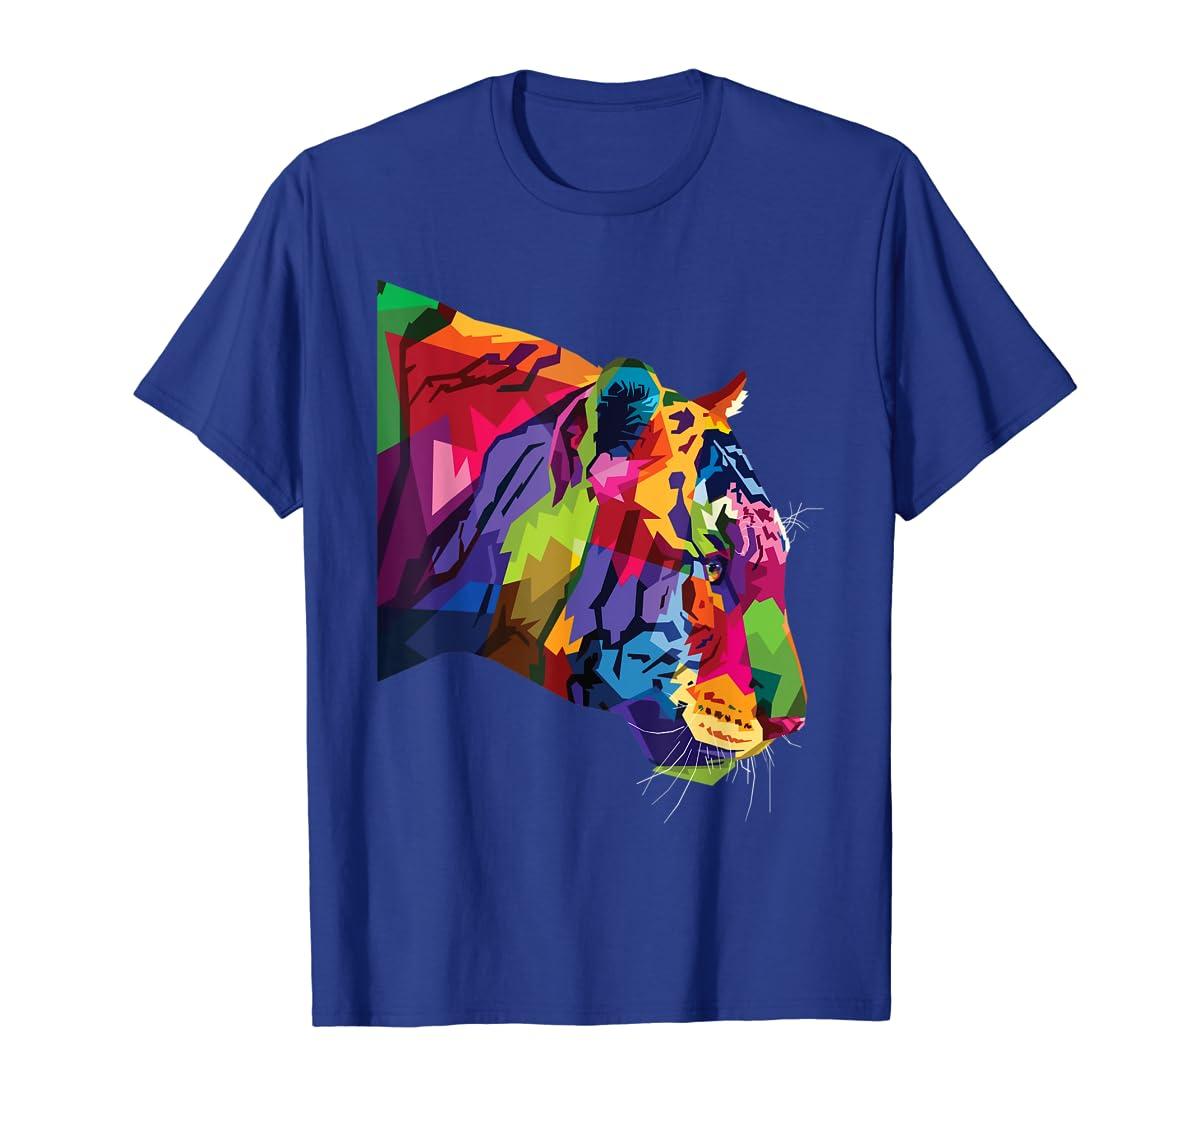 Tiger Shirt : Colorful Tiger's head Pop Art Style T-Shirt-Men's T-Shirt-Royal